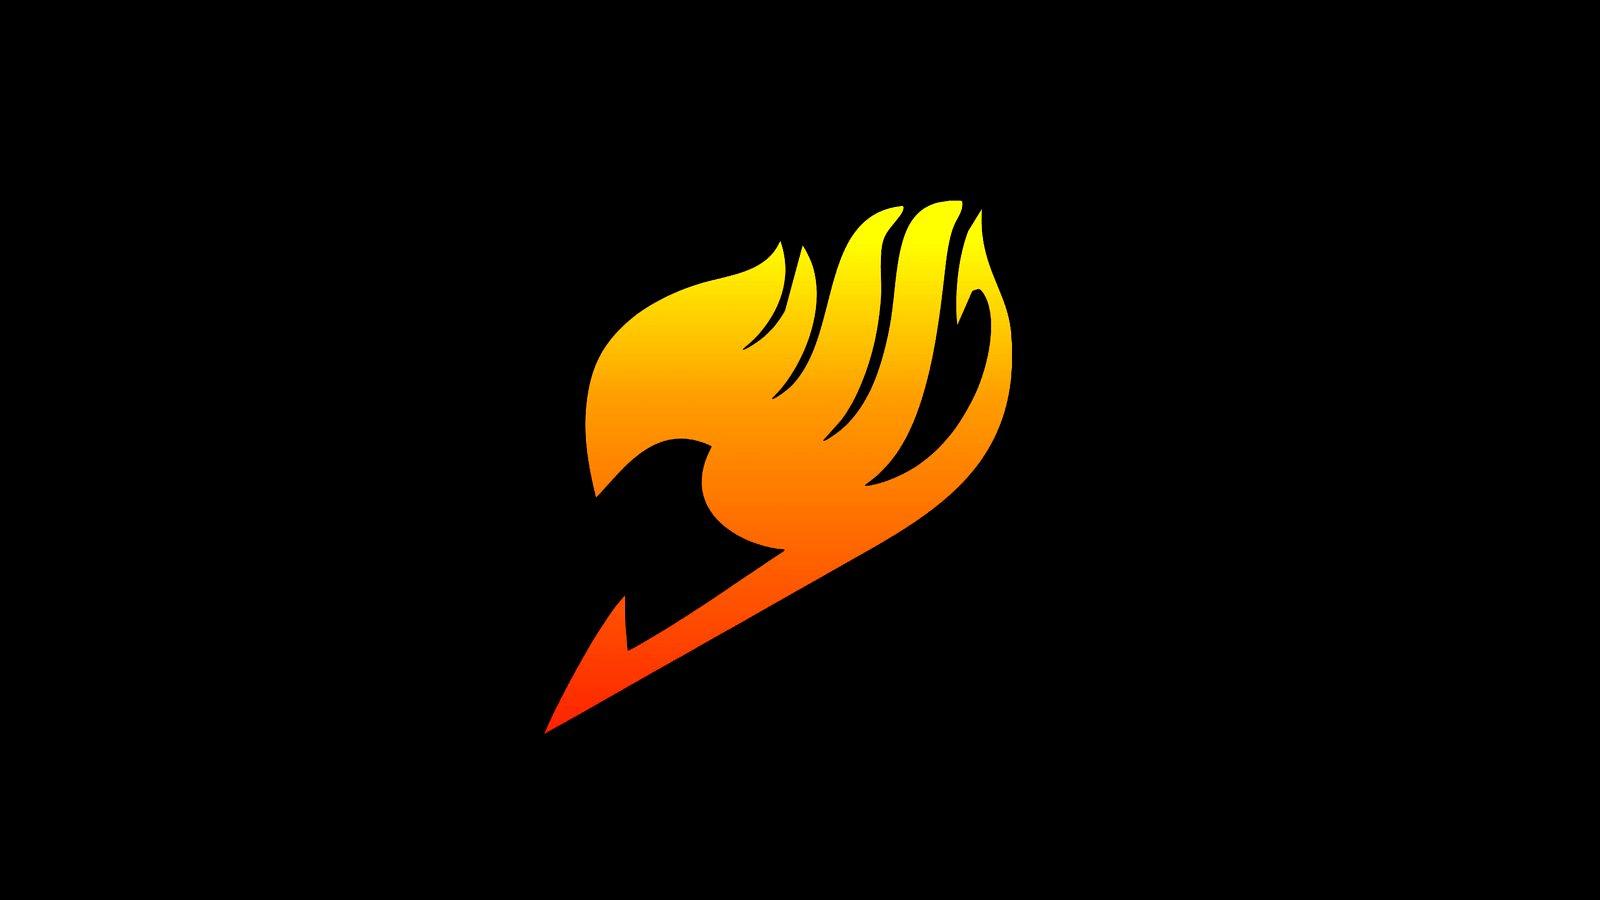 Fairy Tail Yellow Logo Hd Fairy Tail Logo Wallpaper Iphone 1600x900